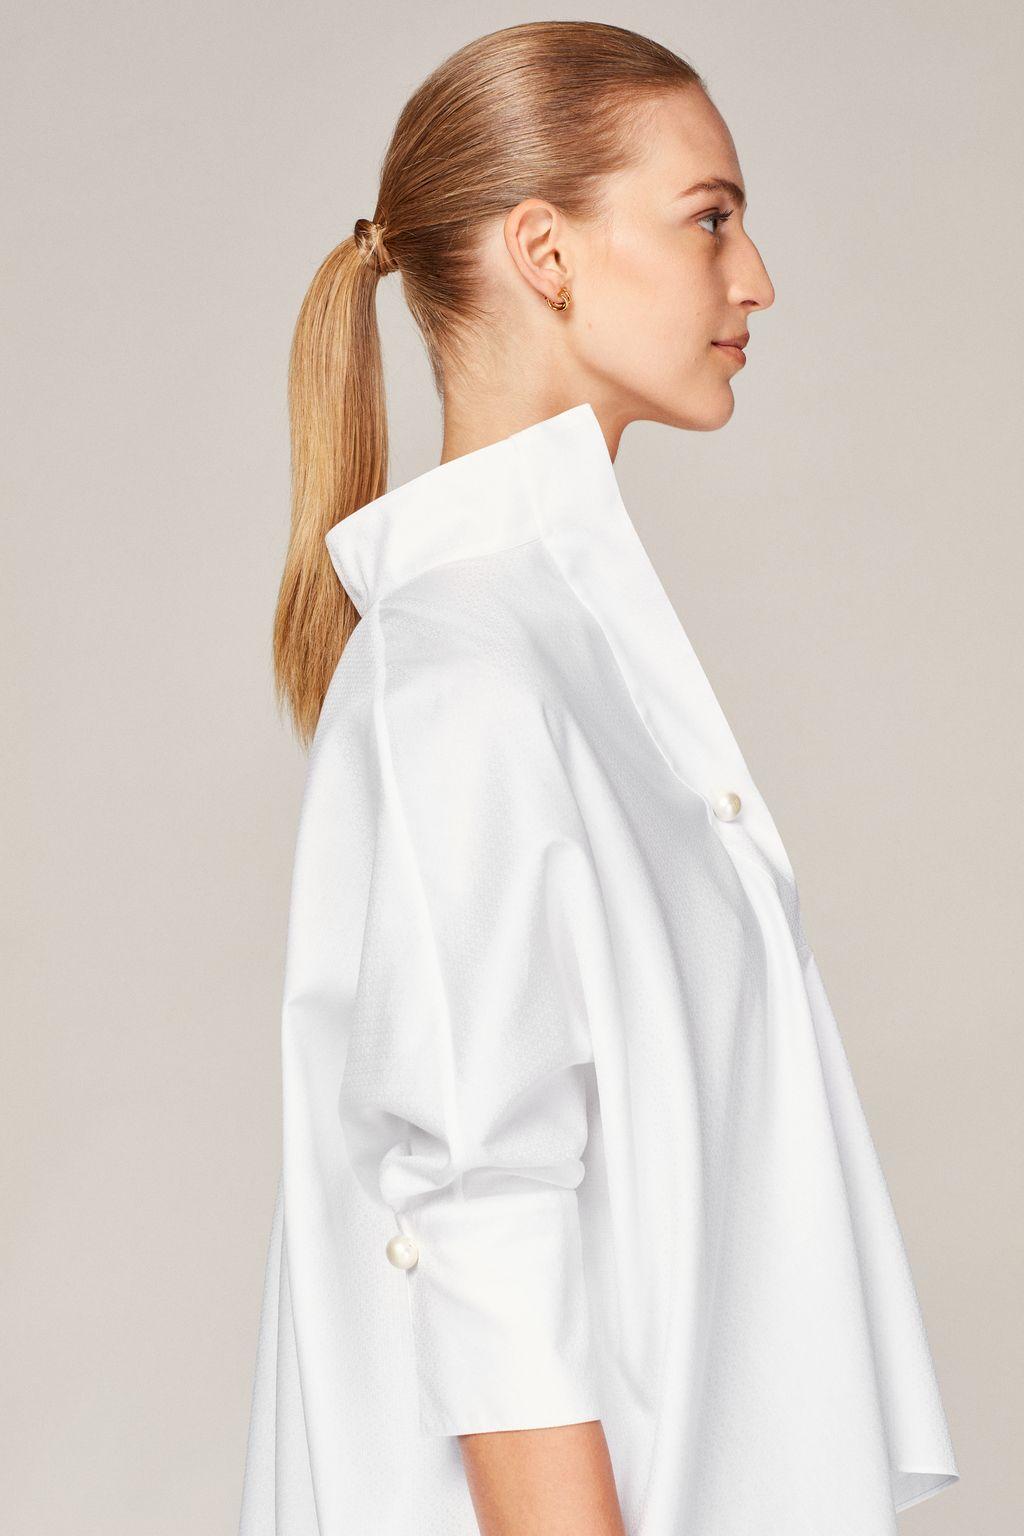 CH jacquard white shirt